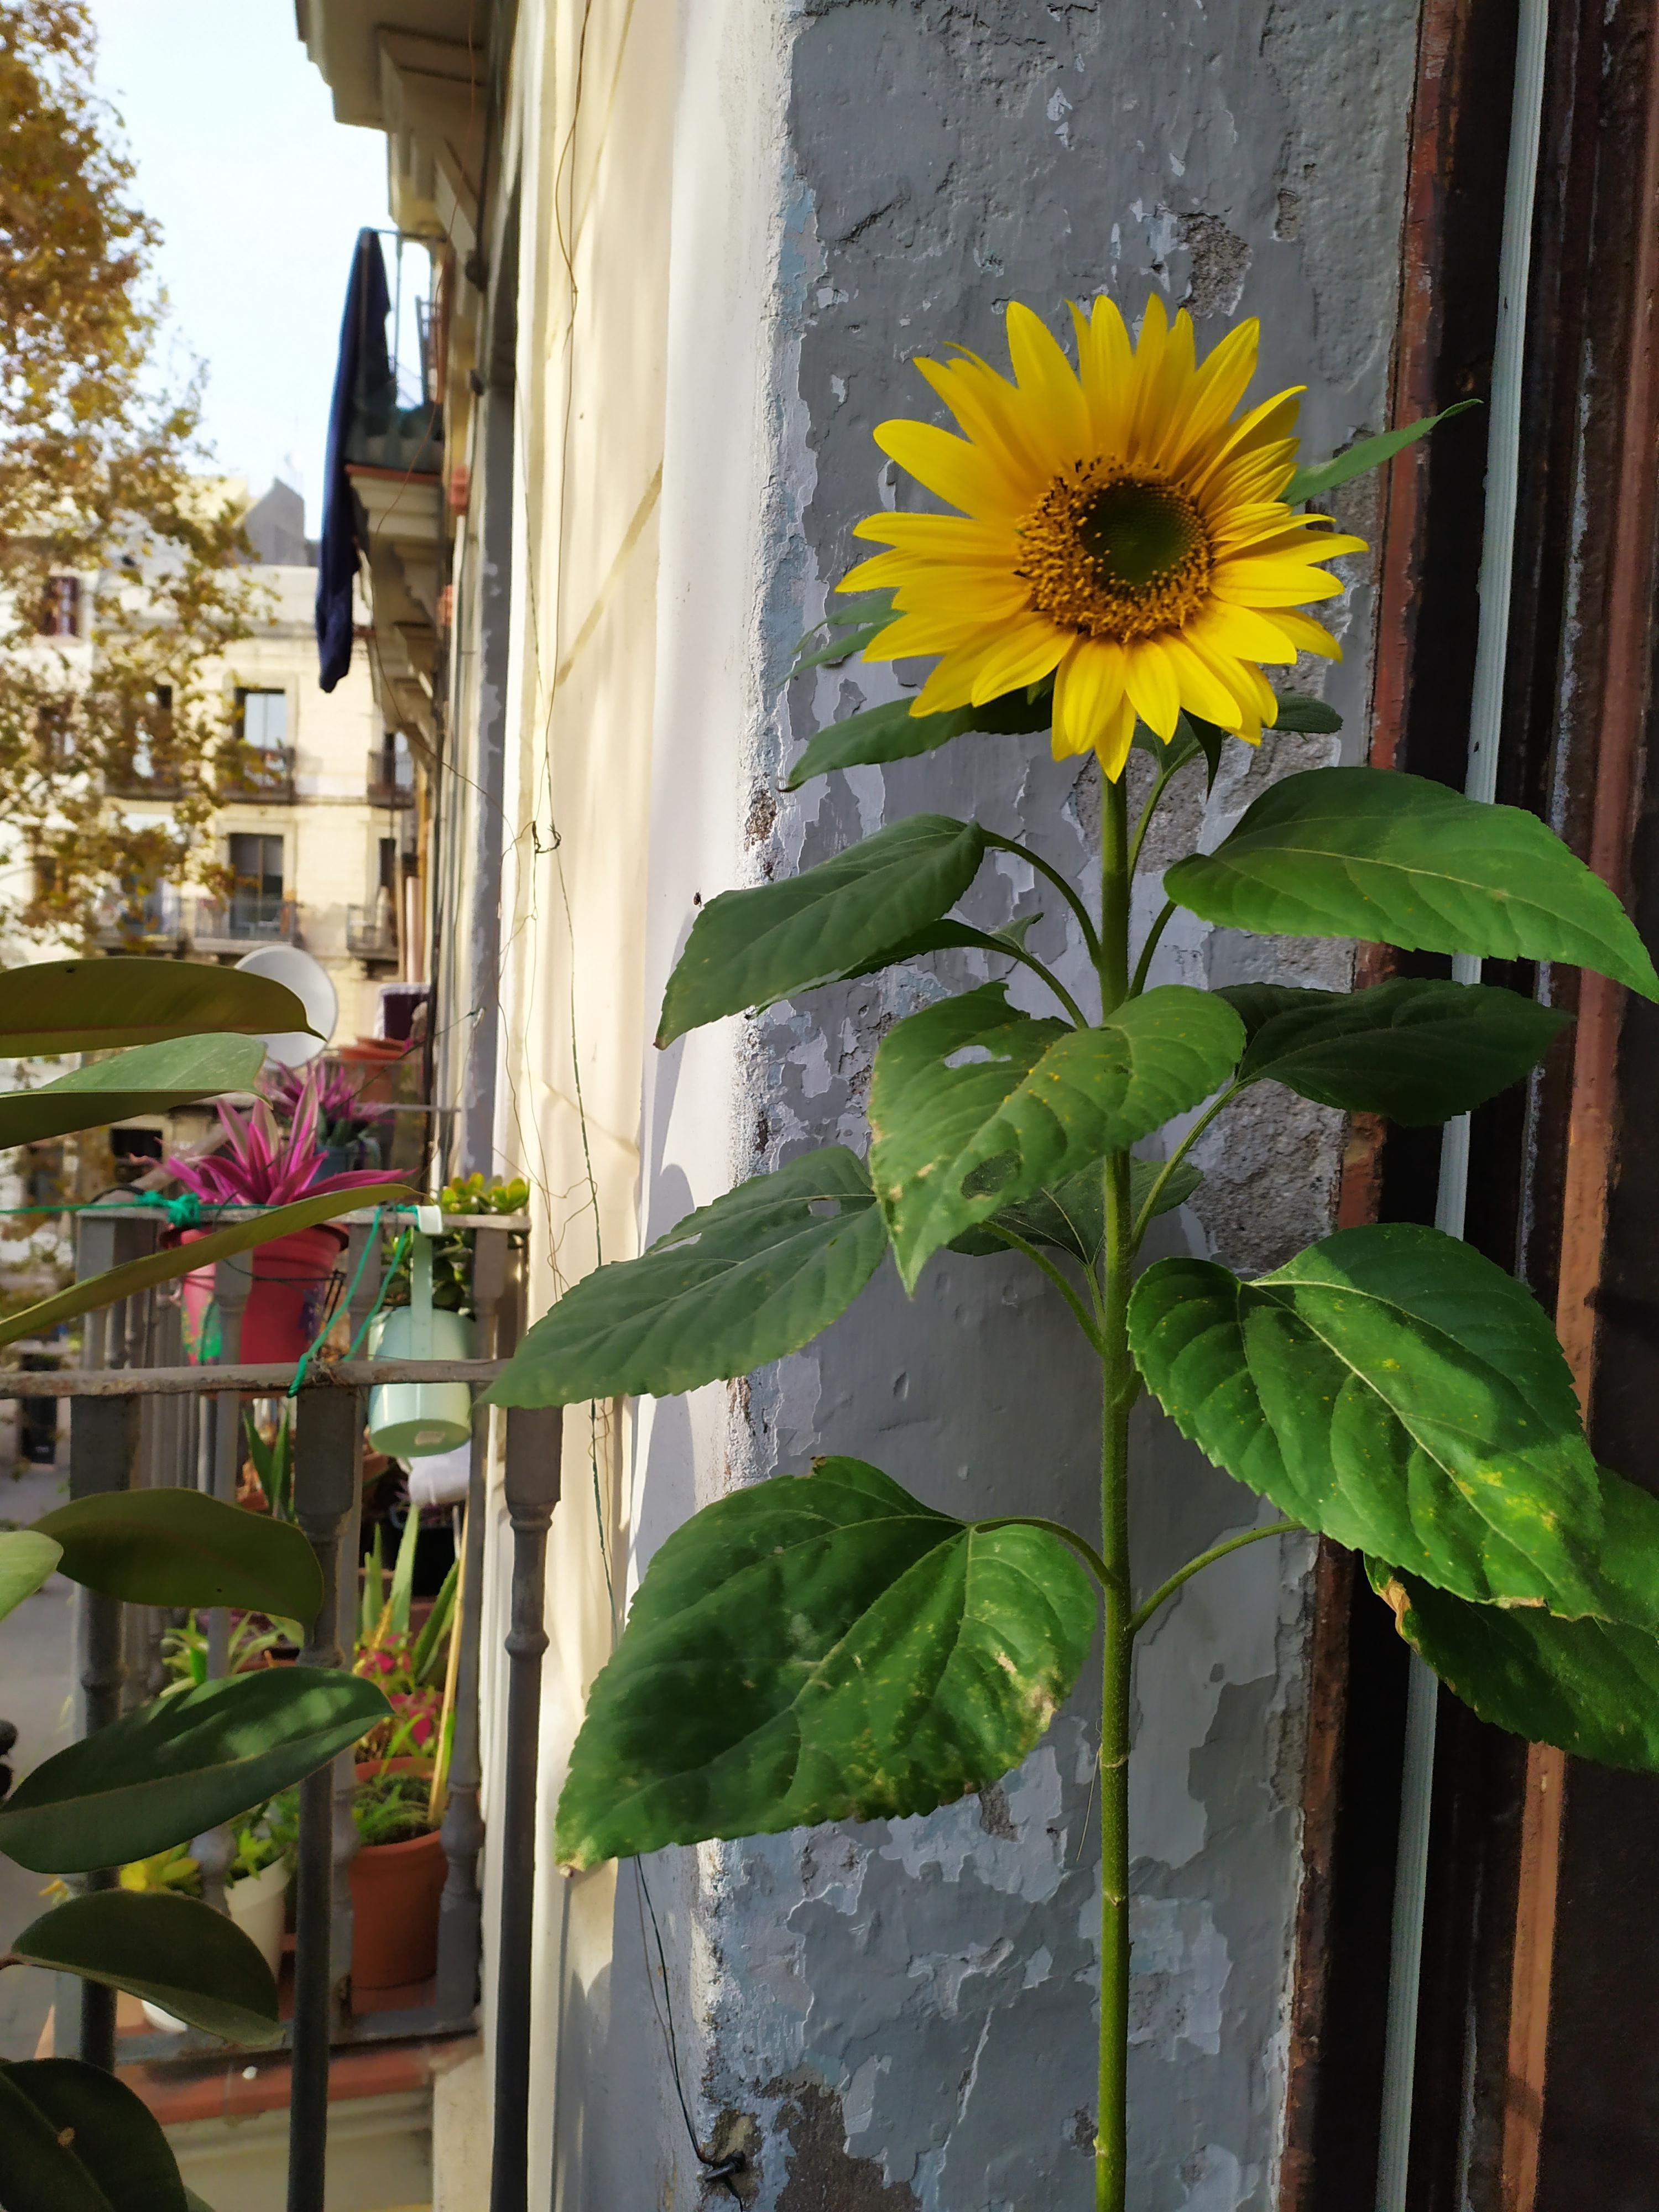 November sunflower on my balcony gardening garden diy